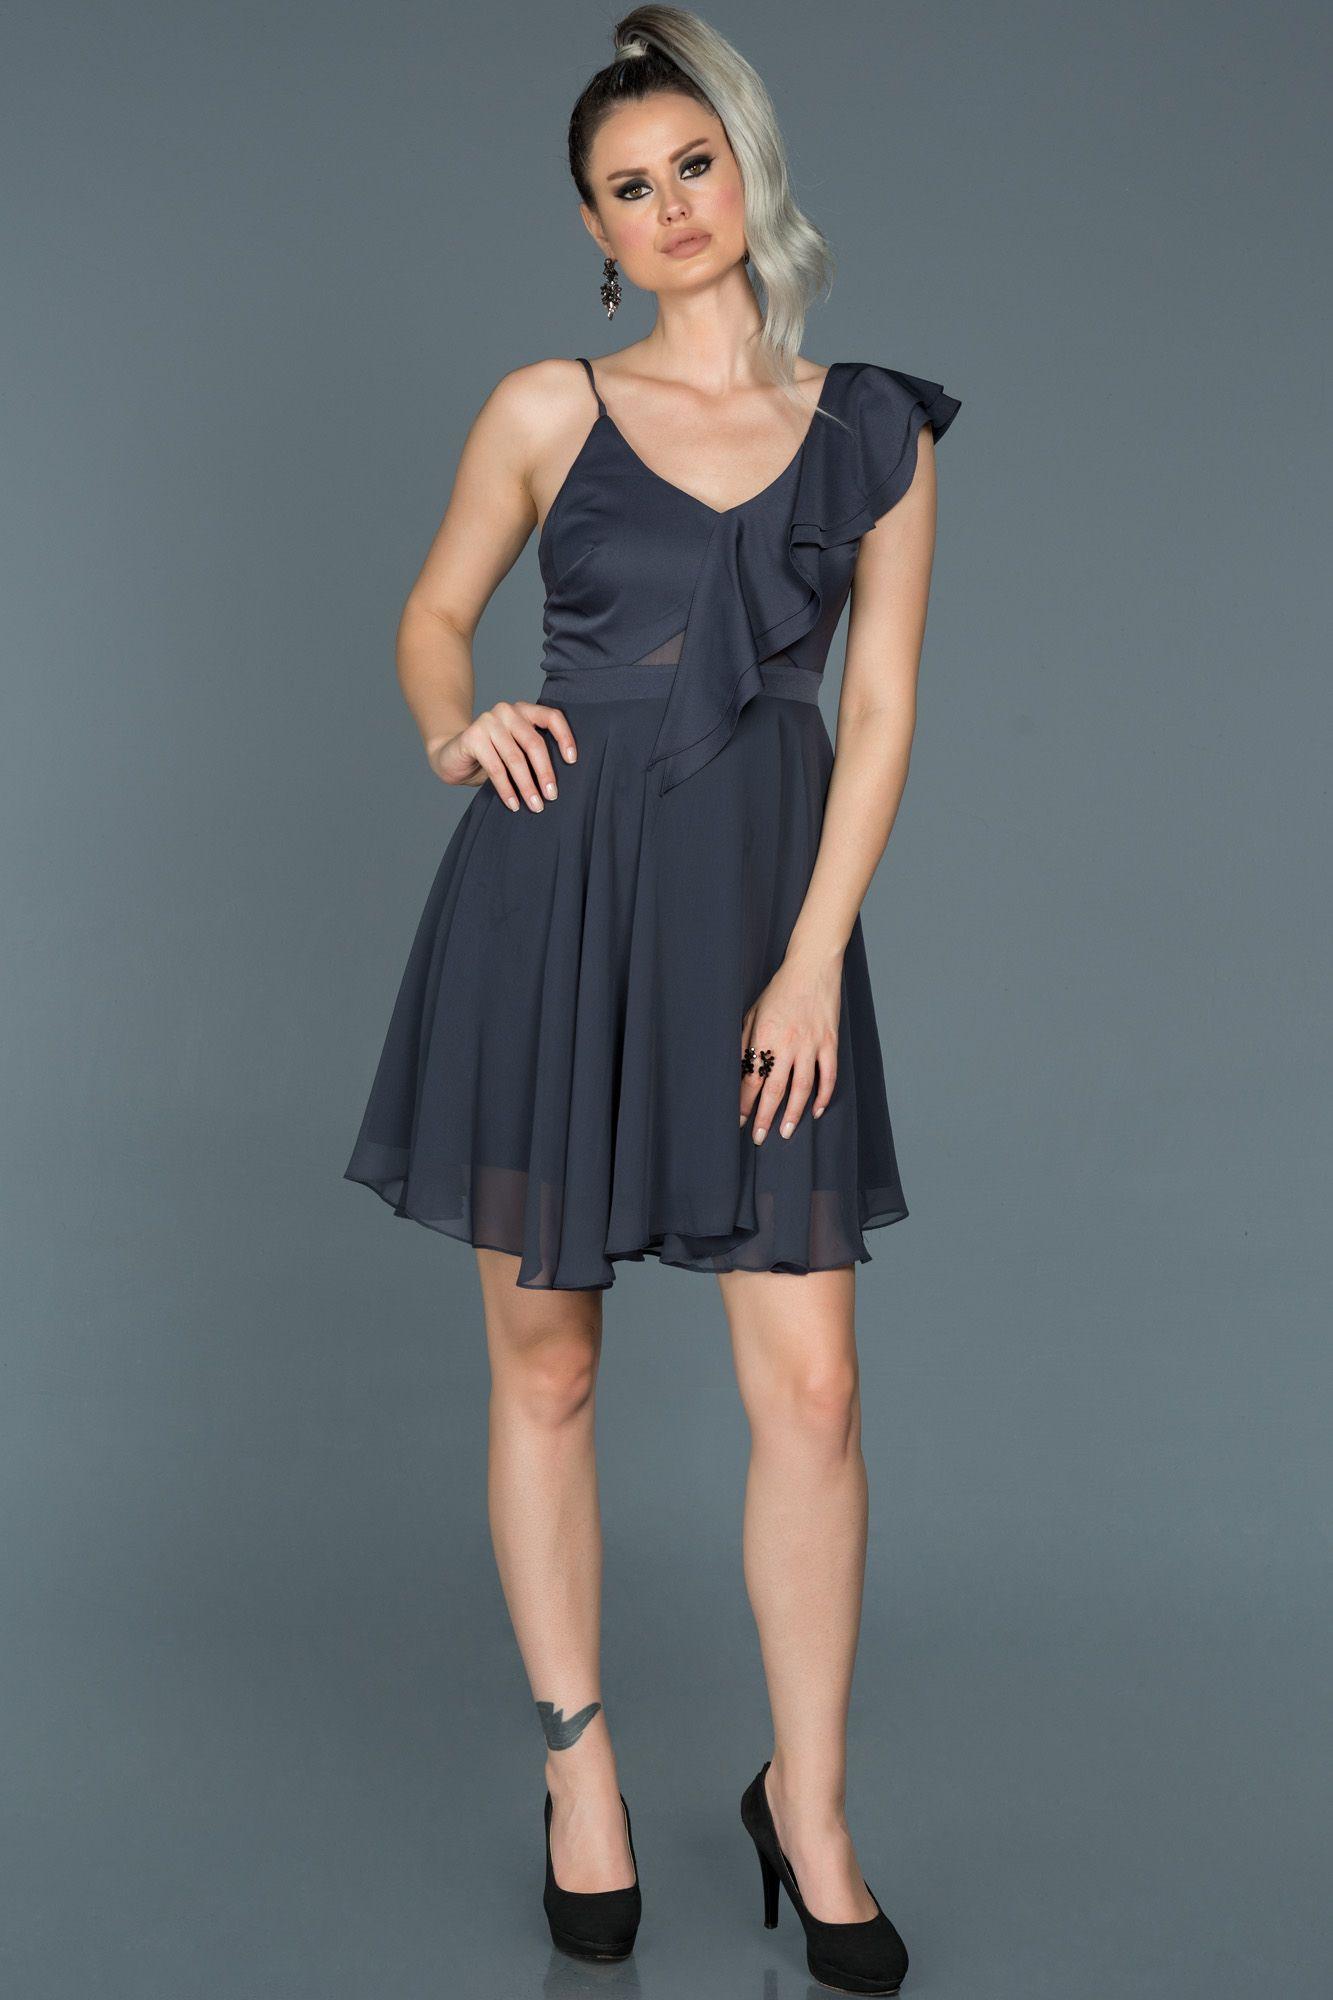 6afcec21e26fa Mezuniyet Elbisesi, Prom Gown #mezuniyetelbisesi, #promgown, #promdress,  #abiyeelbise